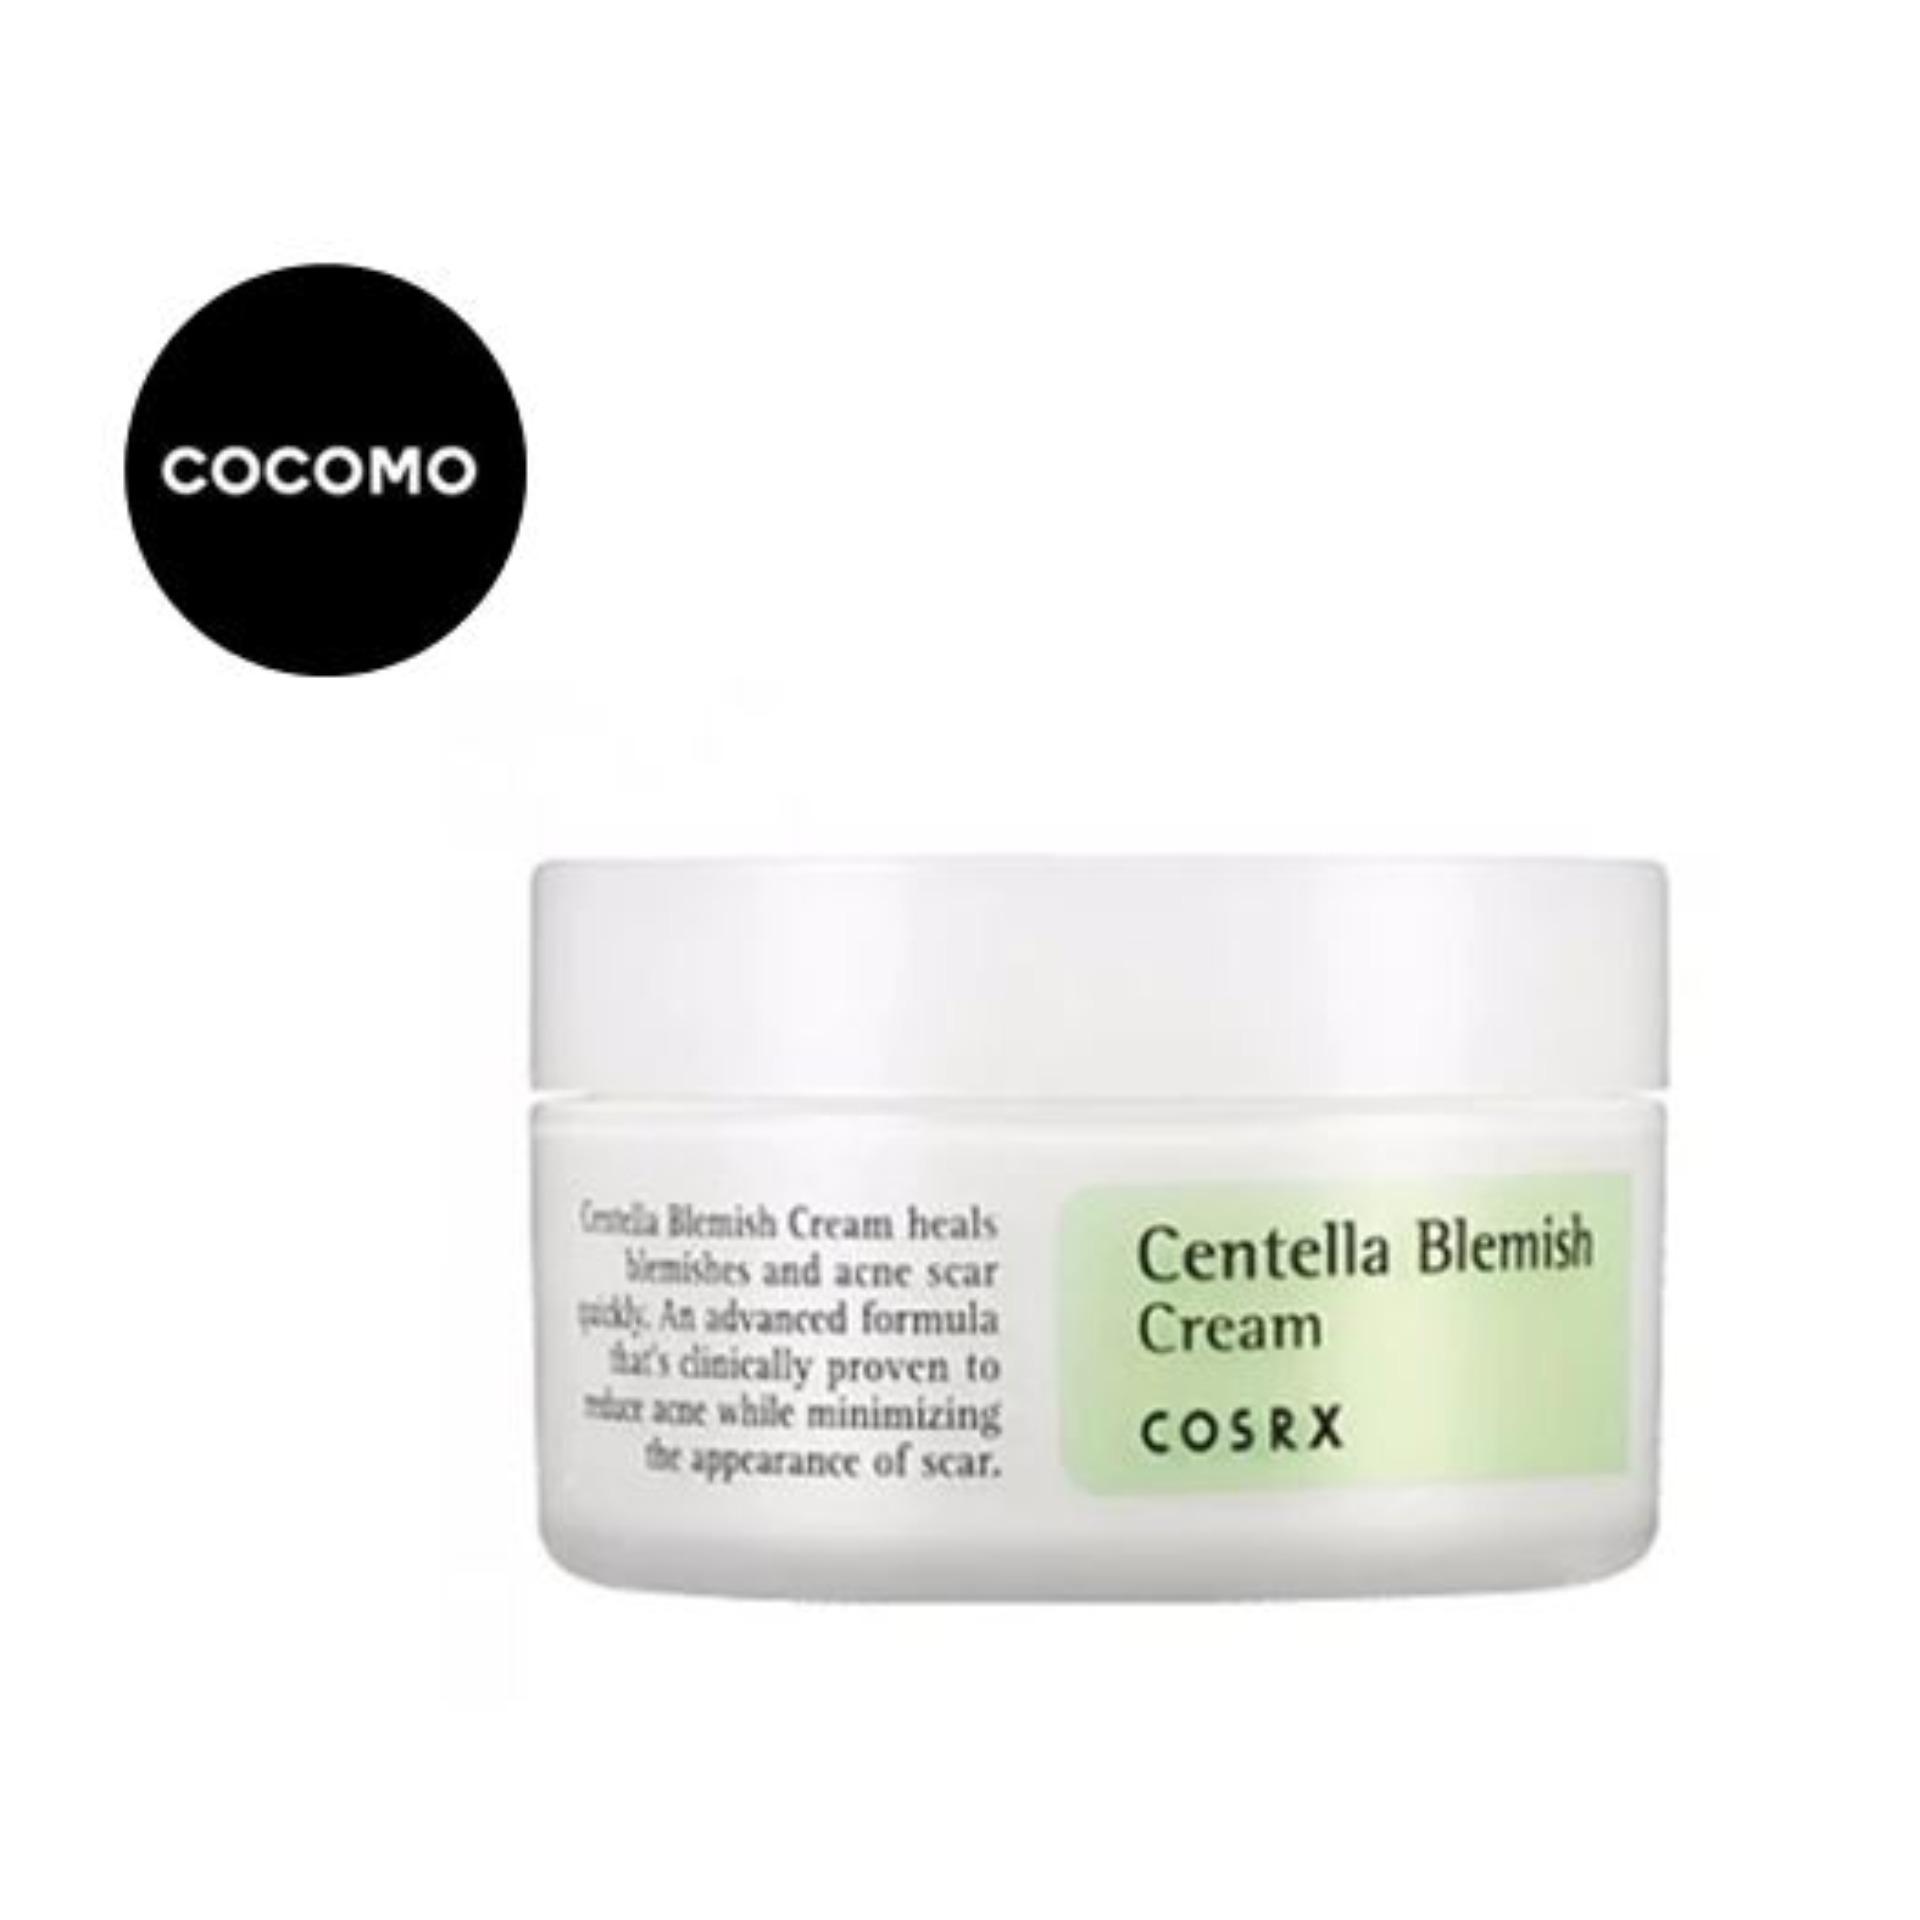 (cosrx) Centella Blemish Cream - Cocomo By Cocomo.